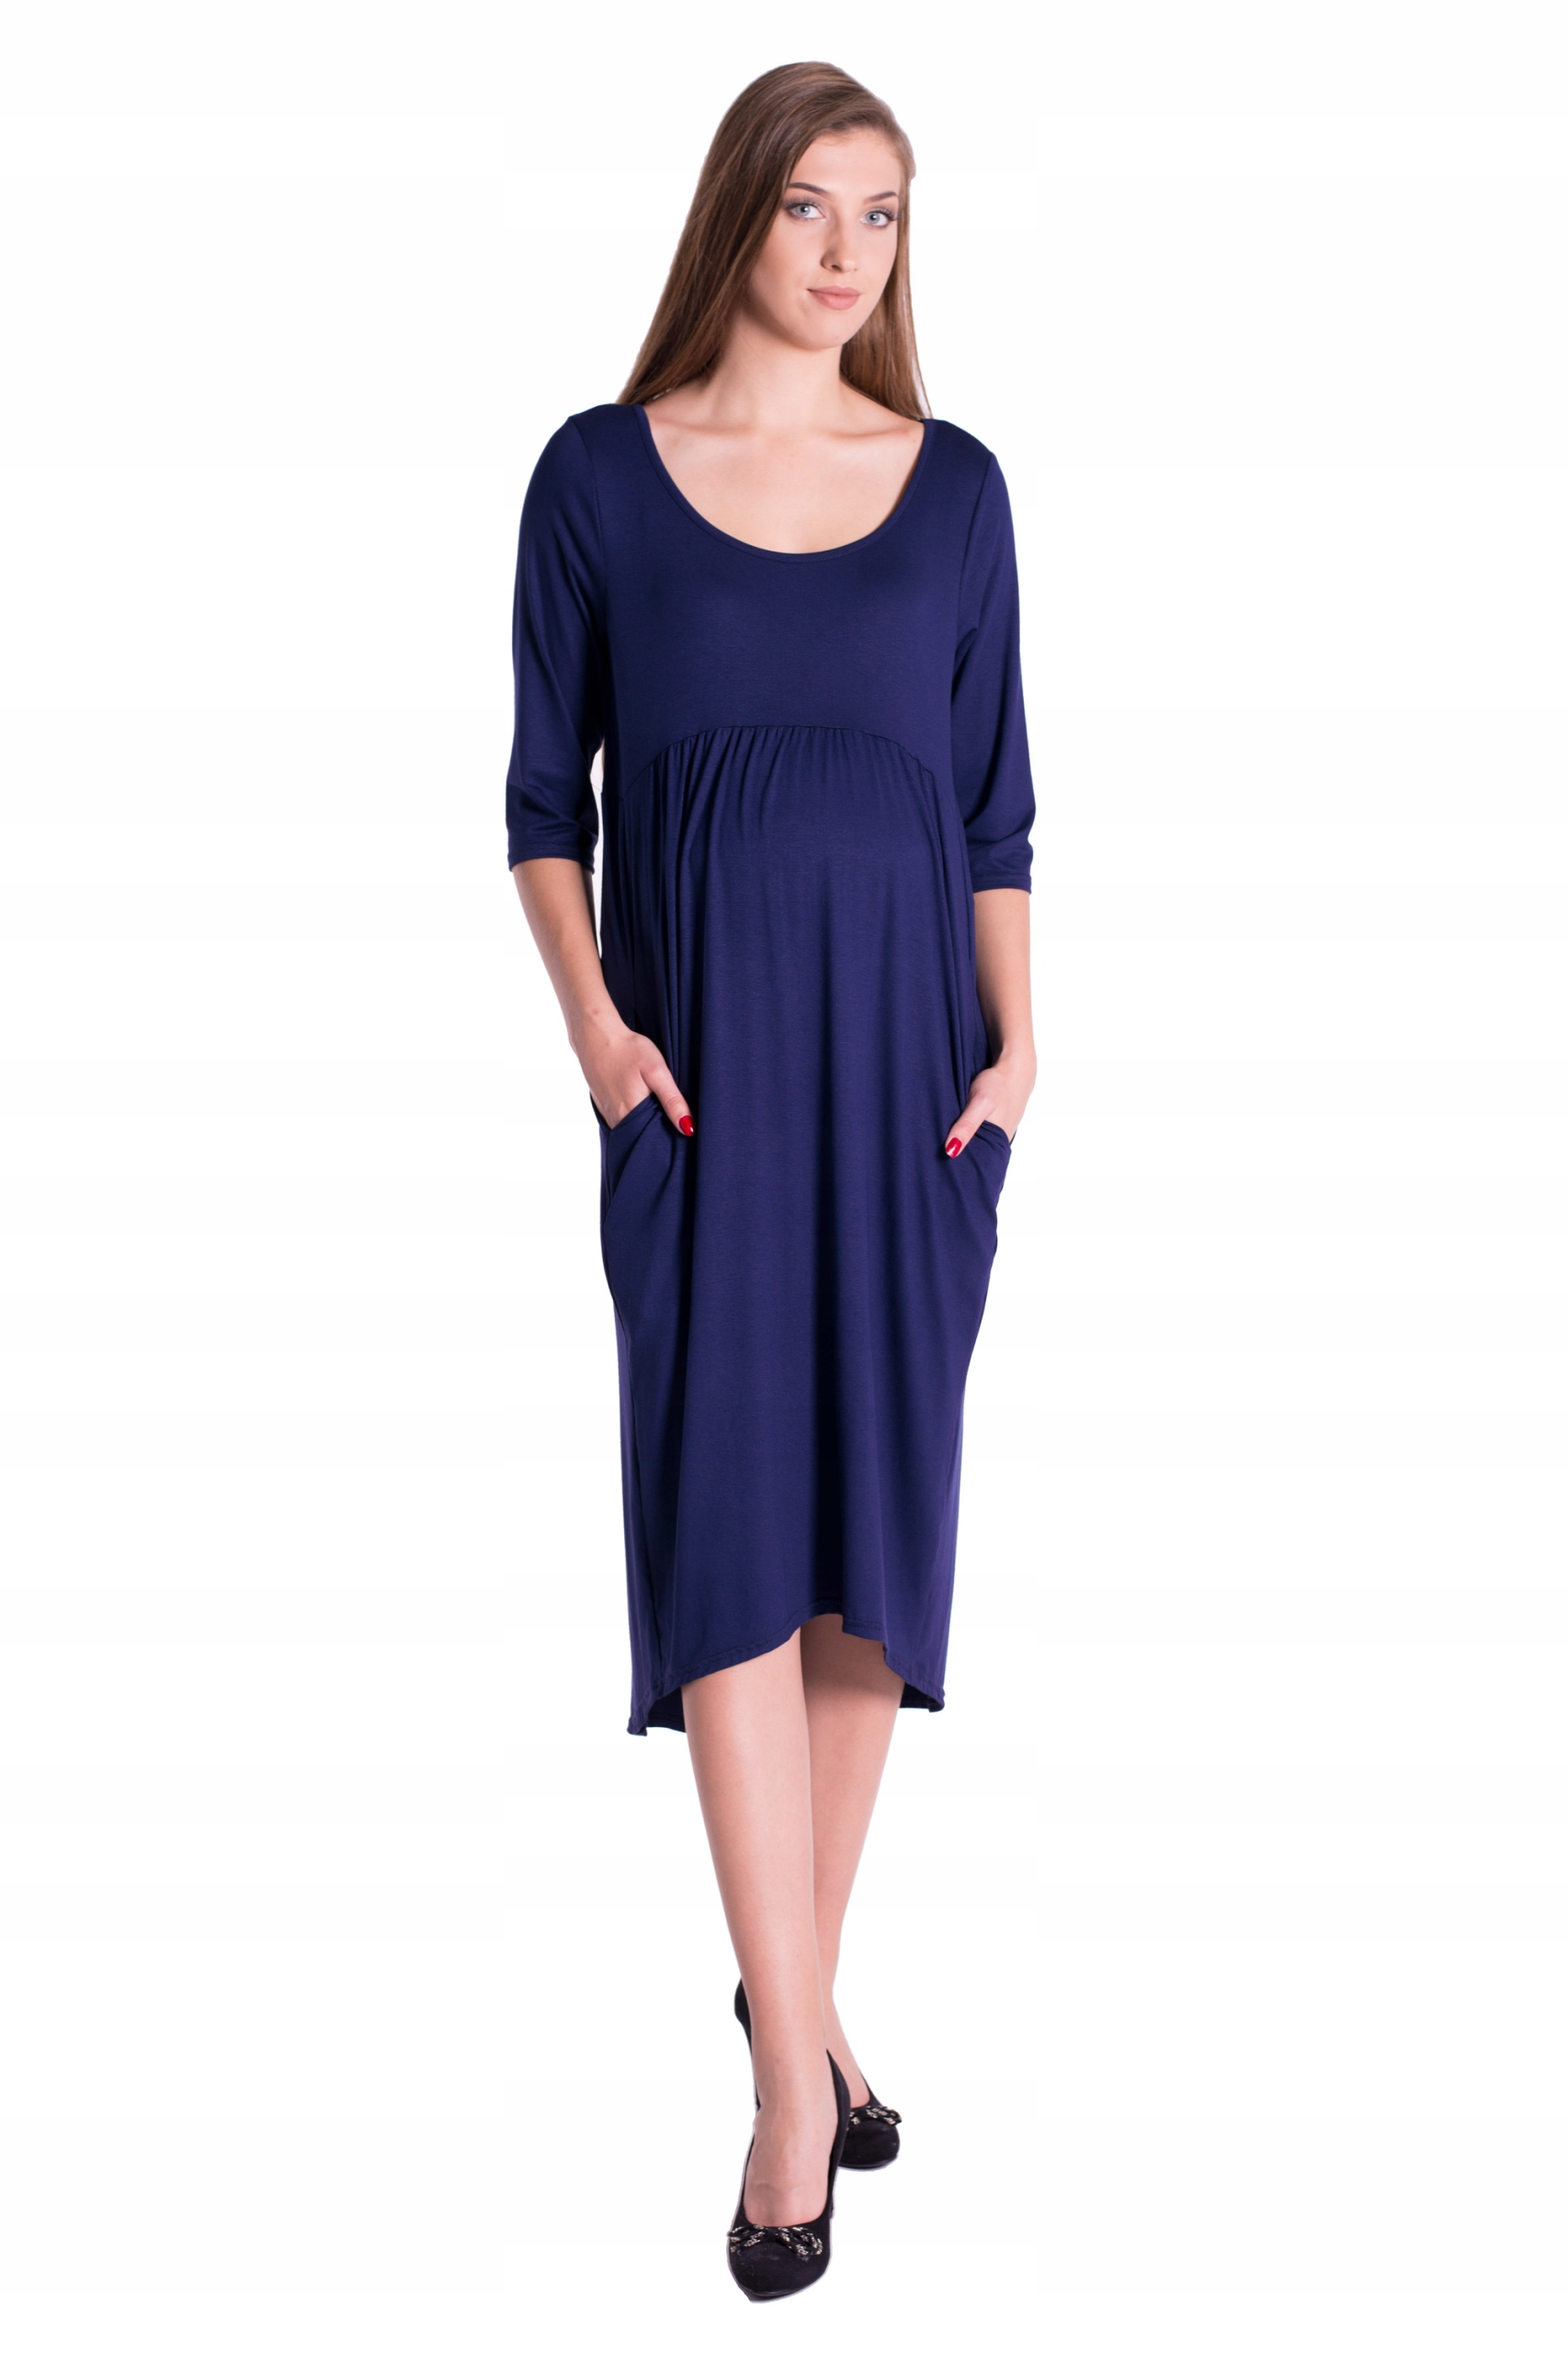 Materská šaty rozkloszowana Oasi 4409 M/L